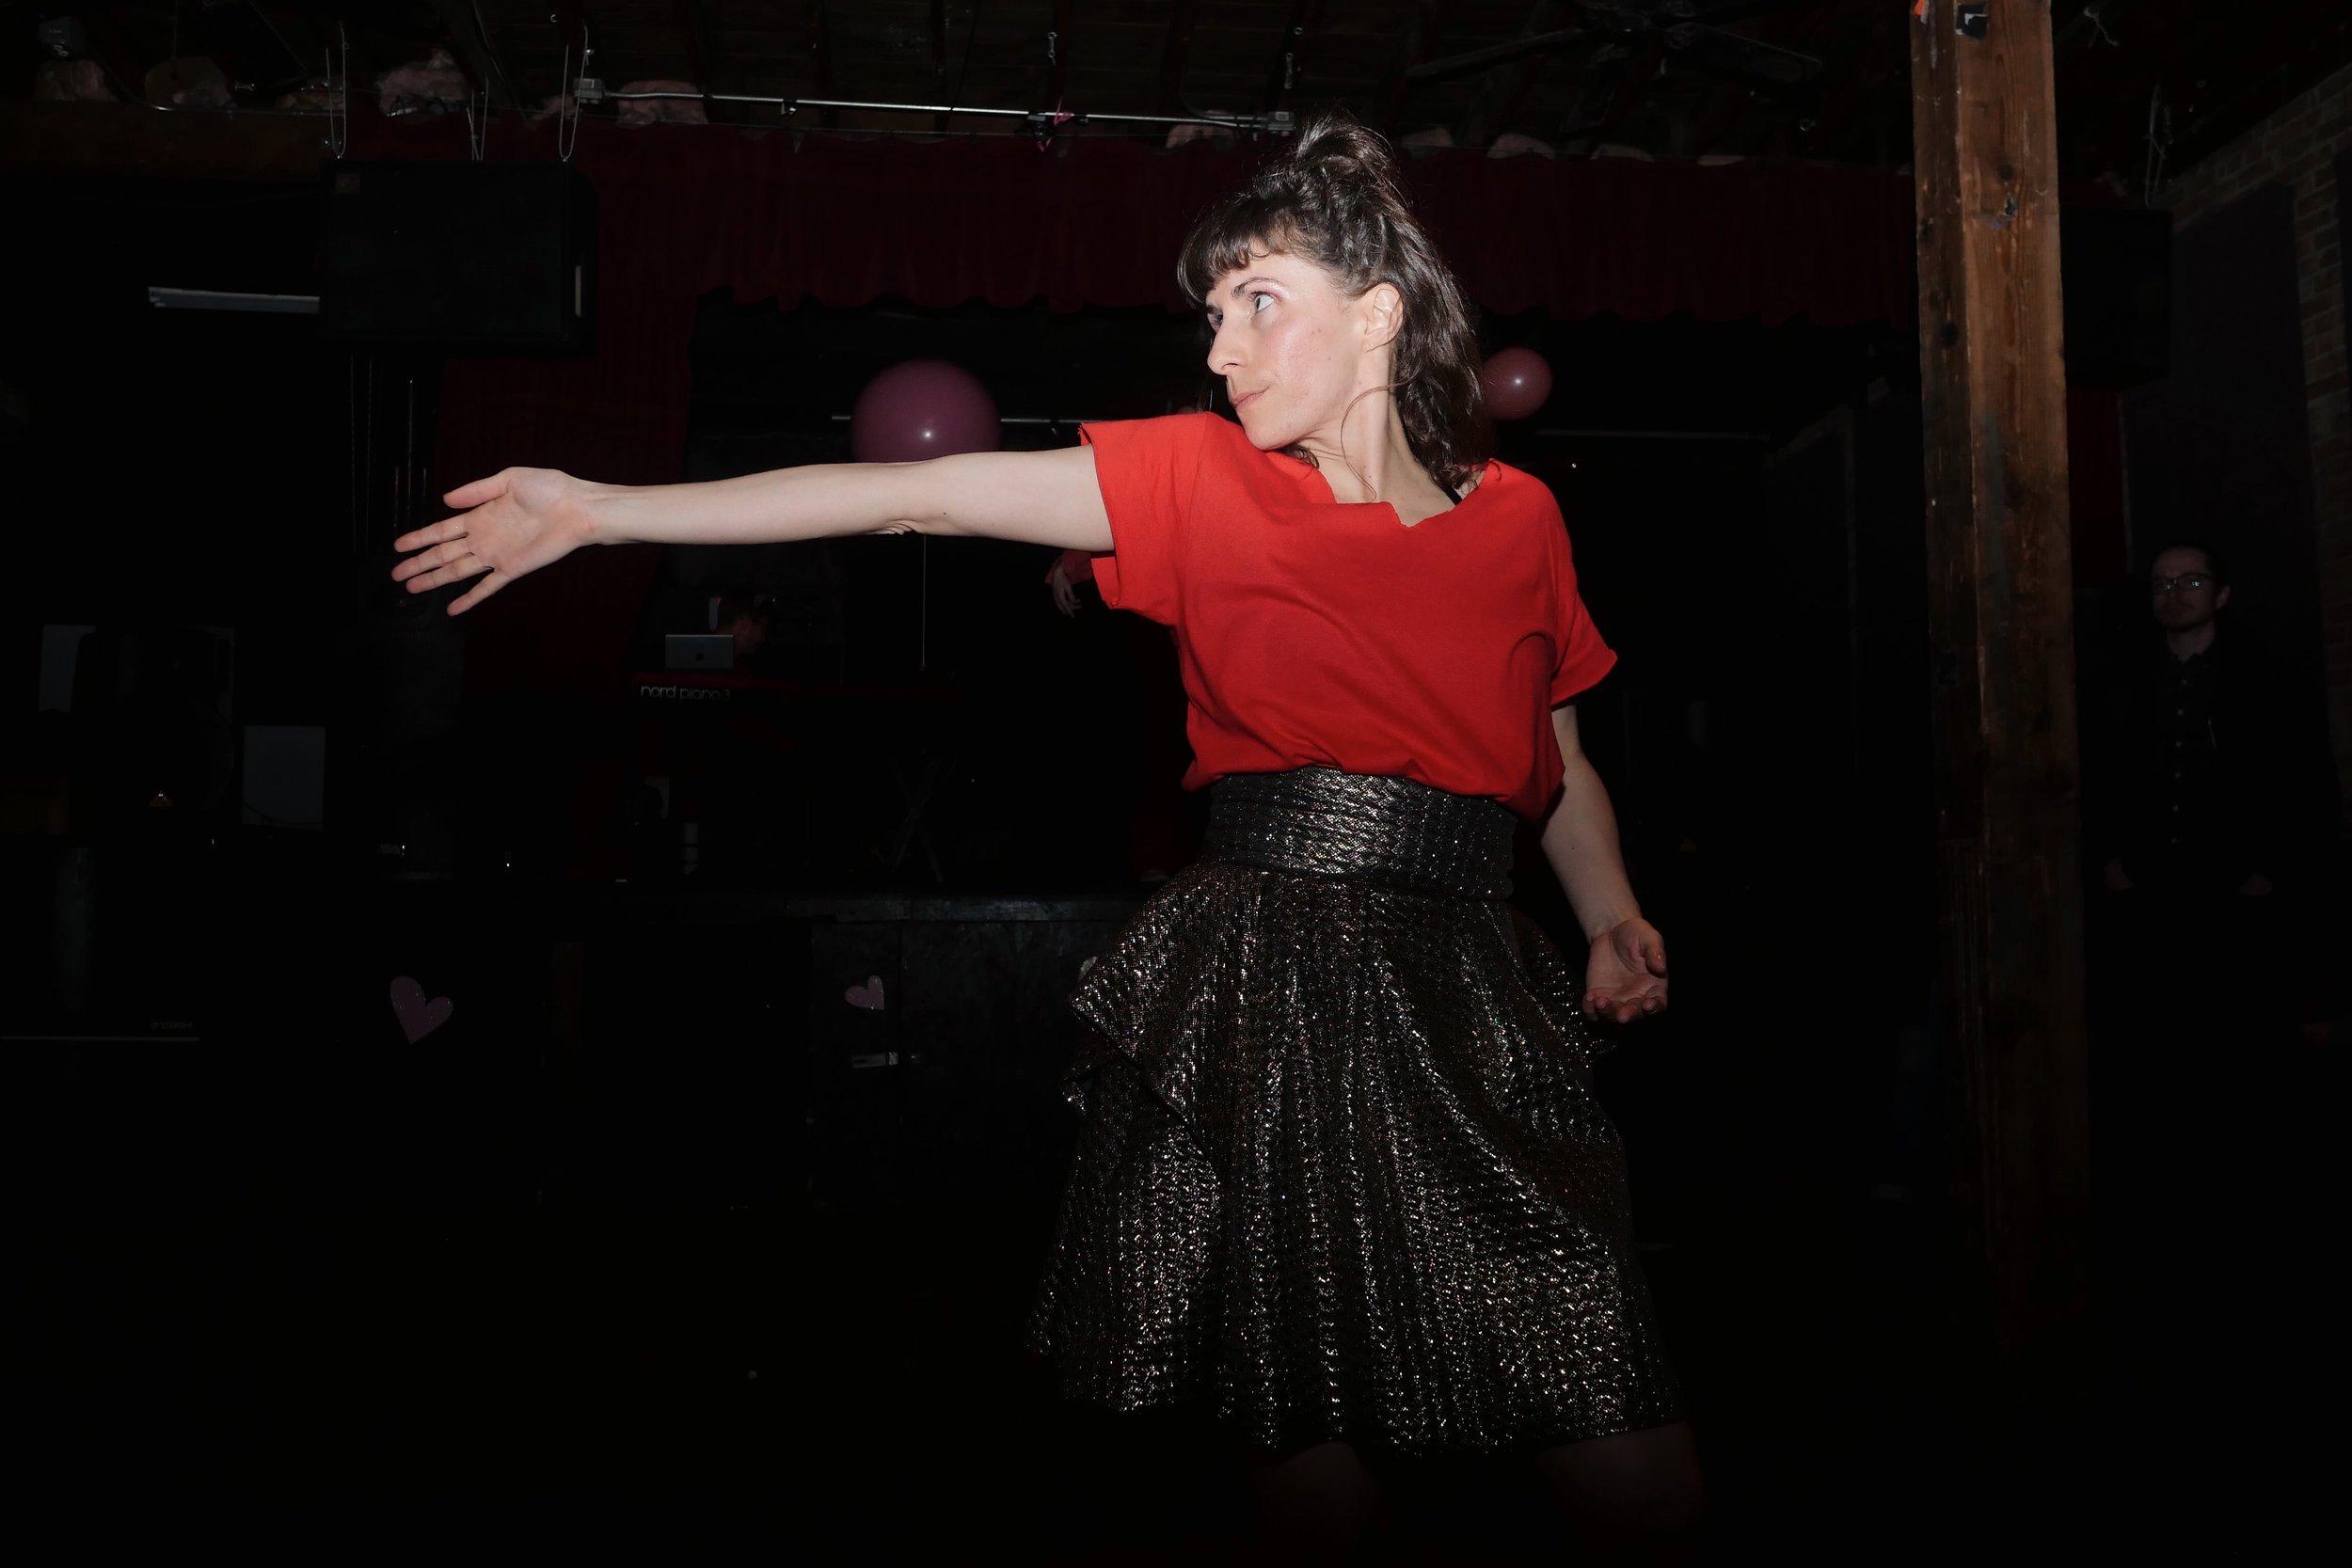 Molly Heller in HEARTLAND + Dance Party. Photo by Tori Duhaime.